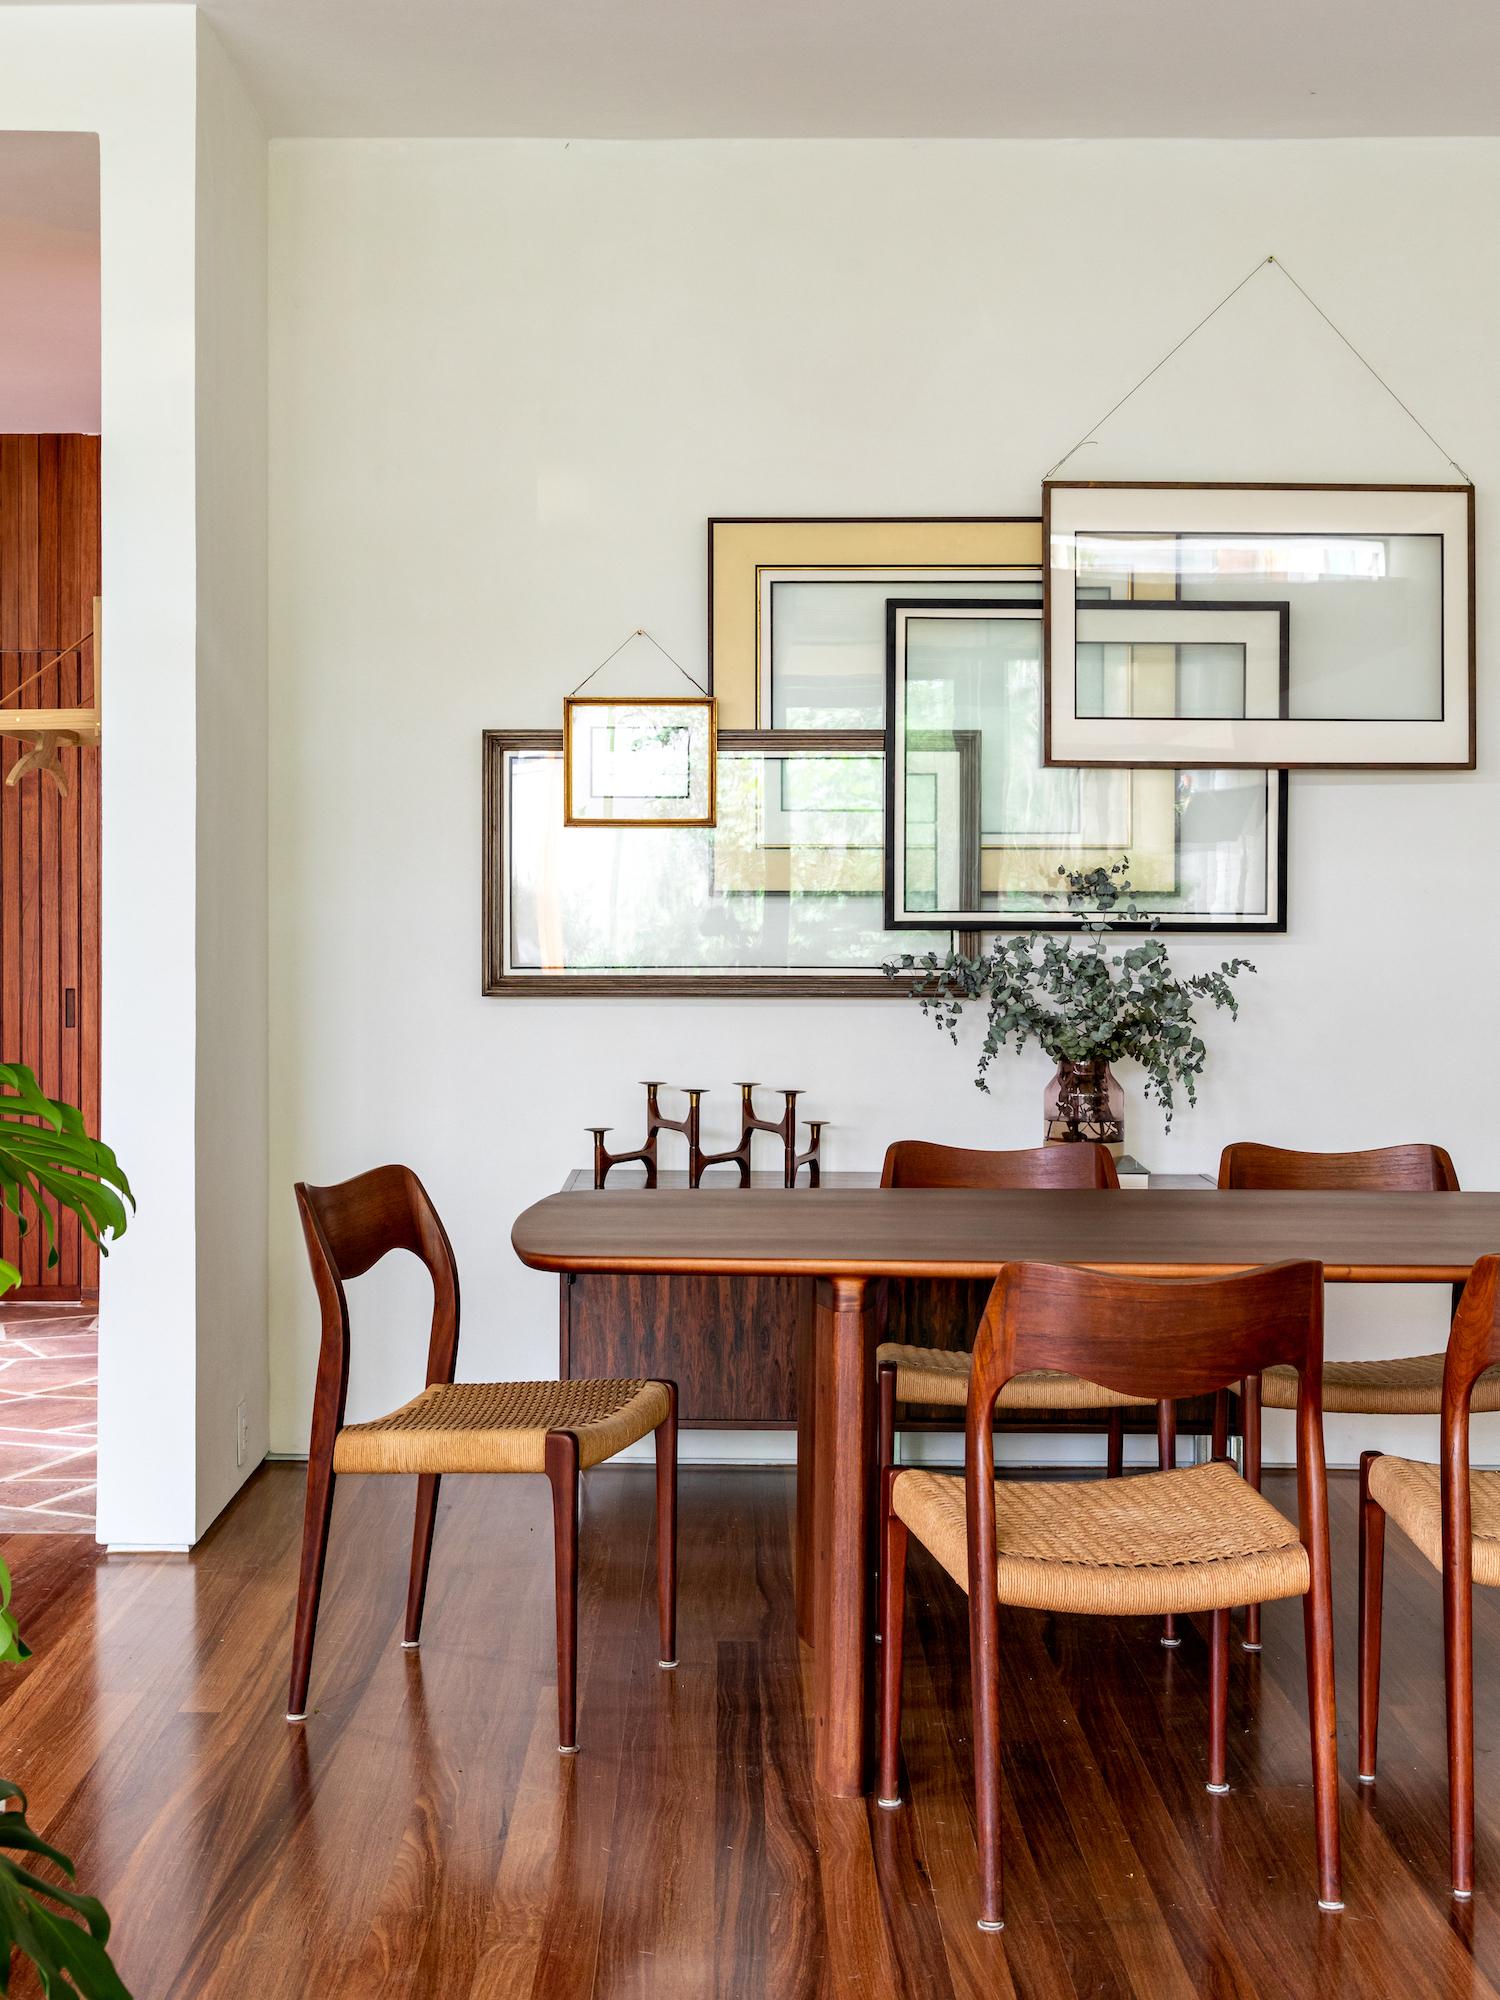 est living where architects live felipe hess 14